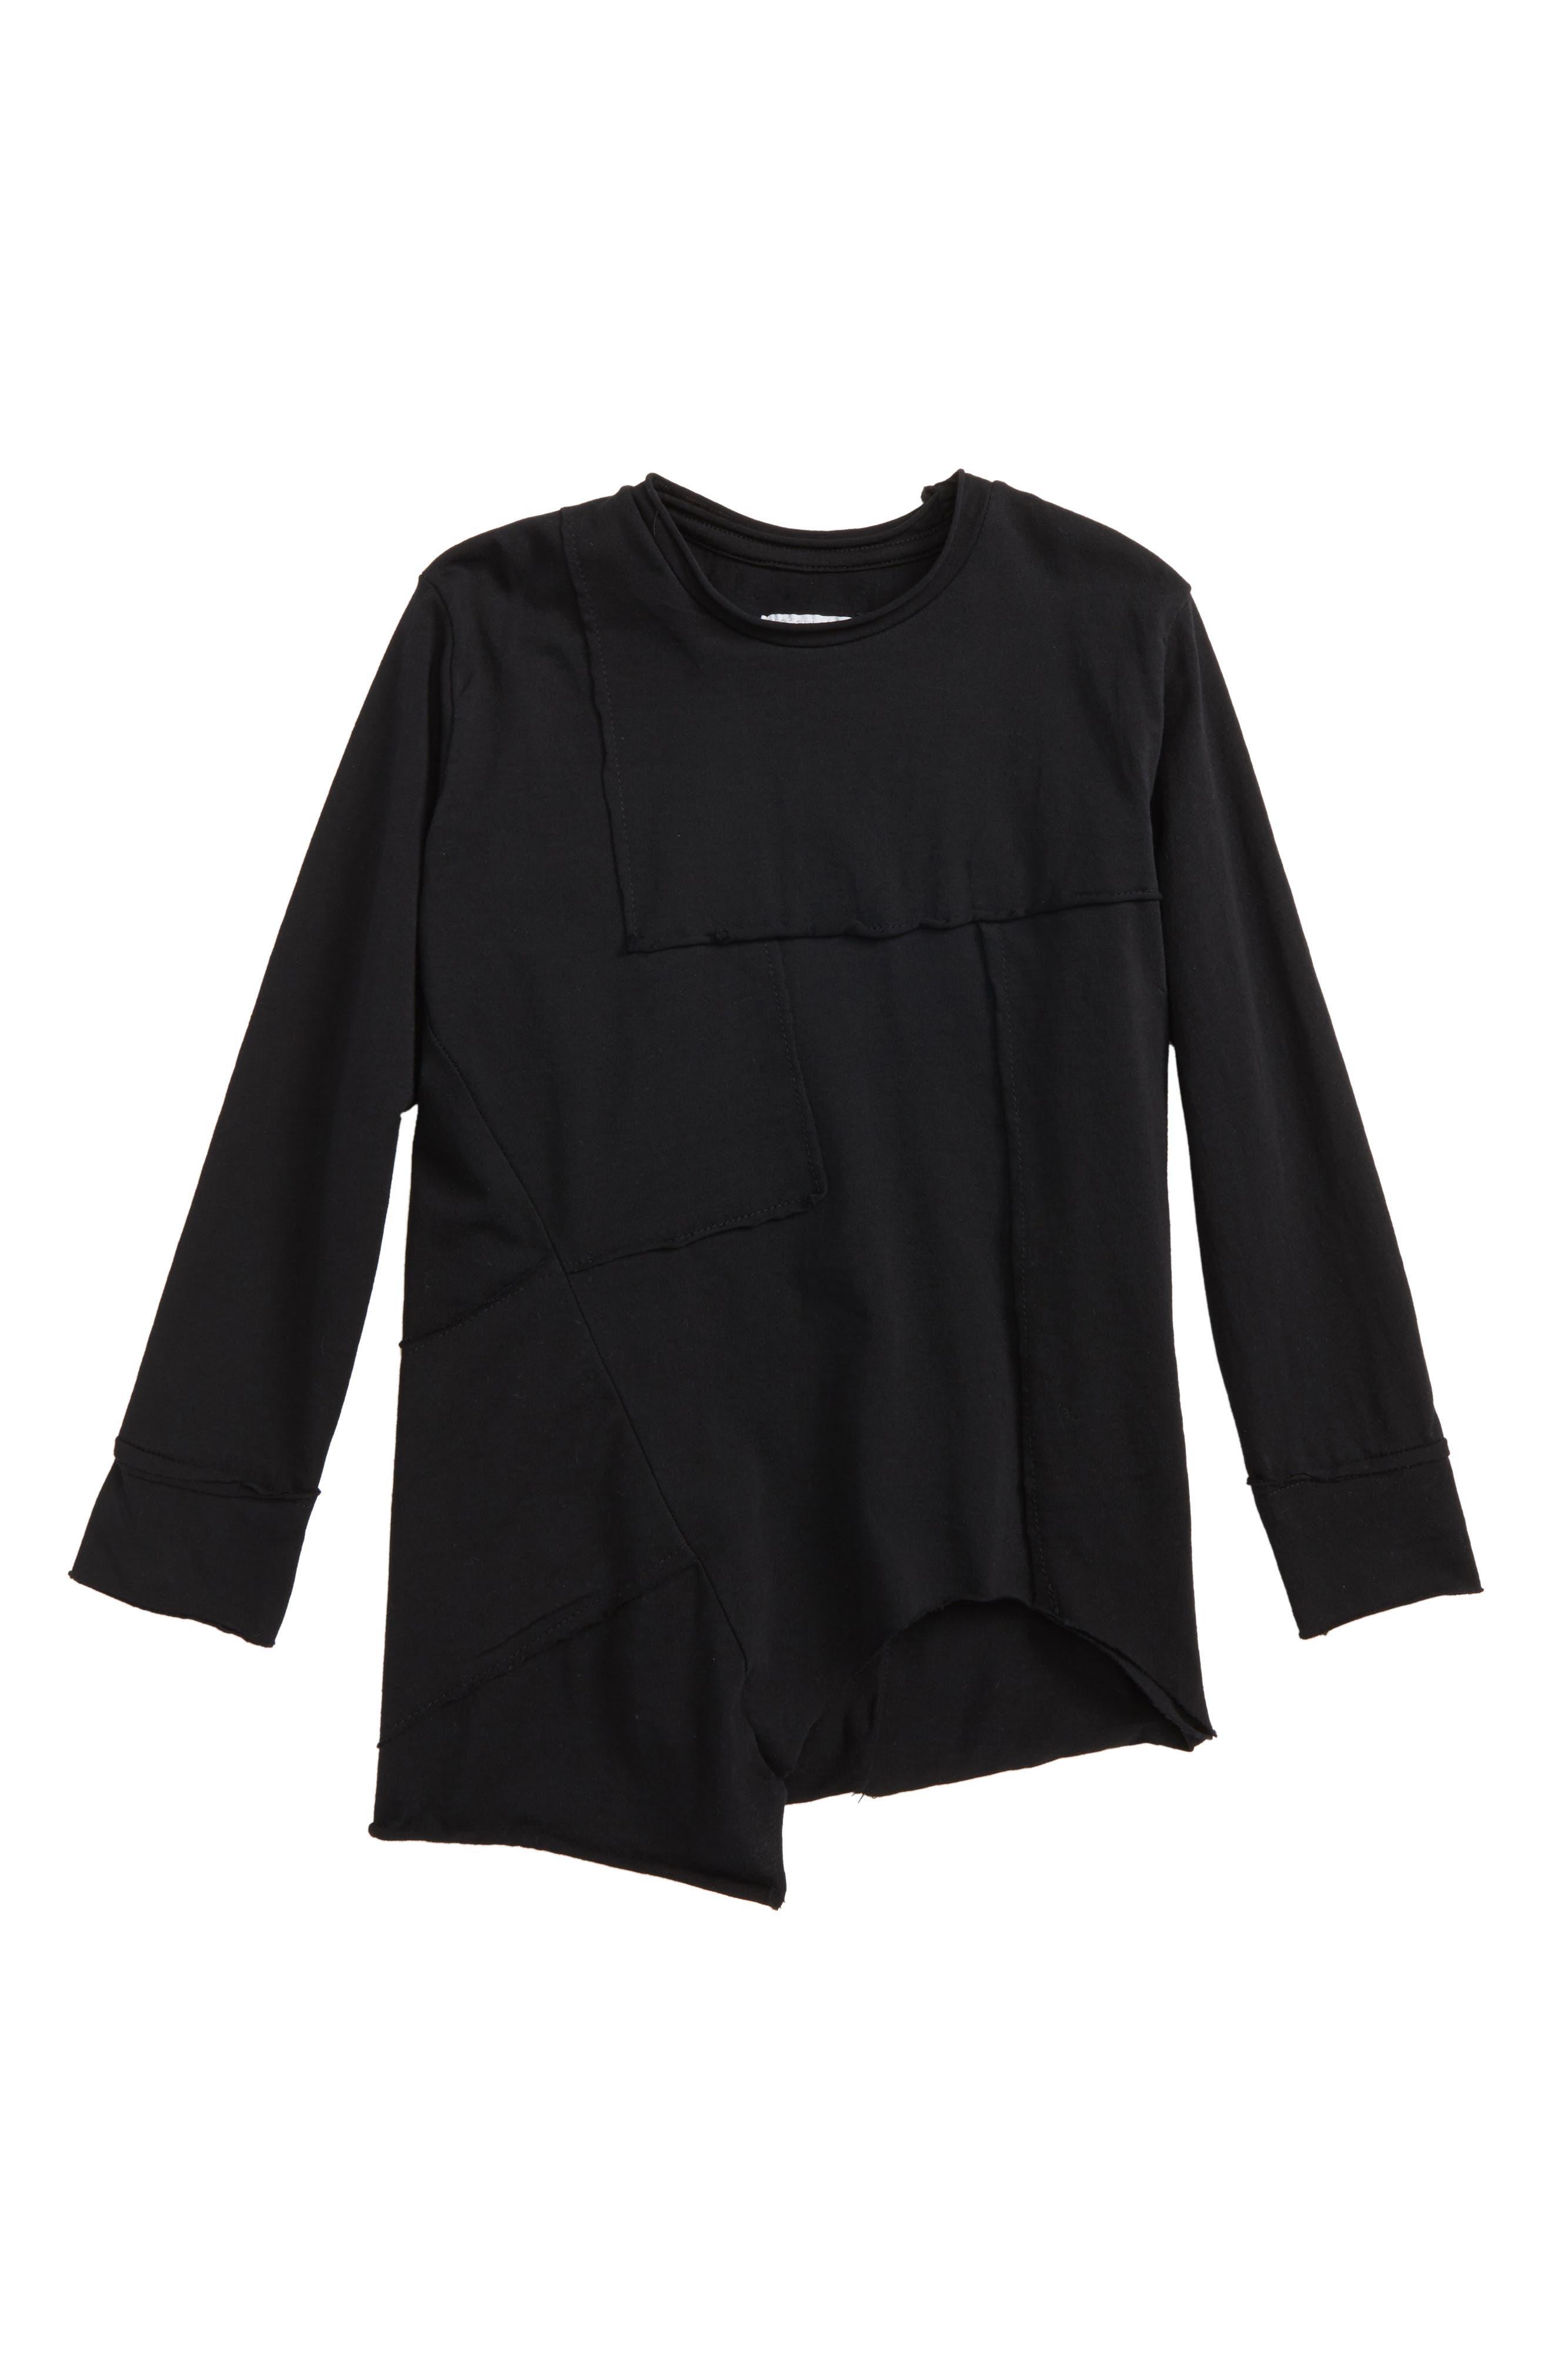 Patchwork Shirt,                         Main,                         color, Black